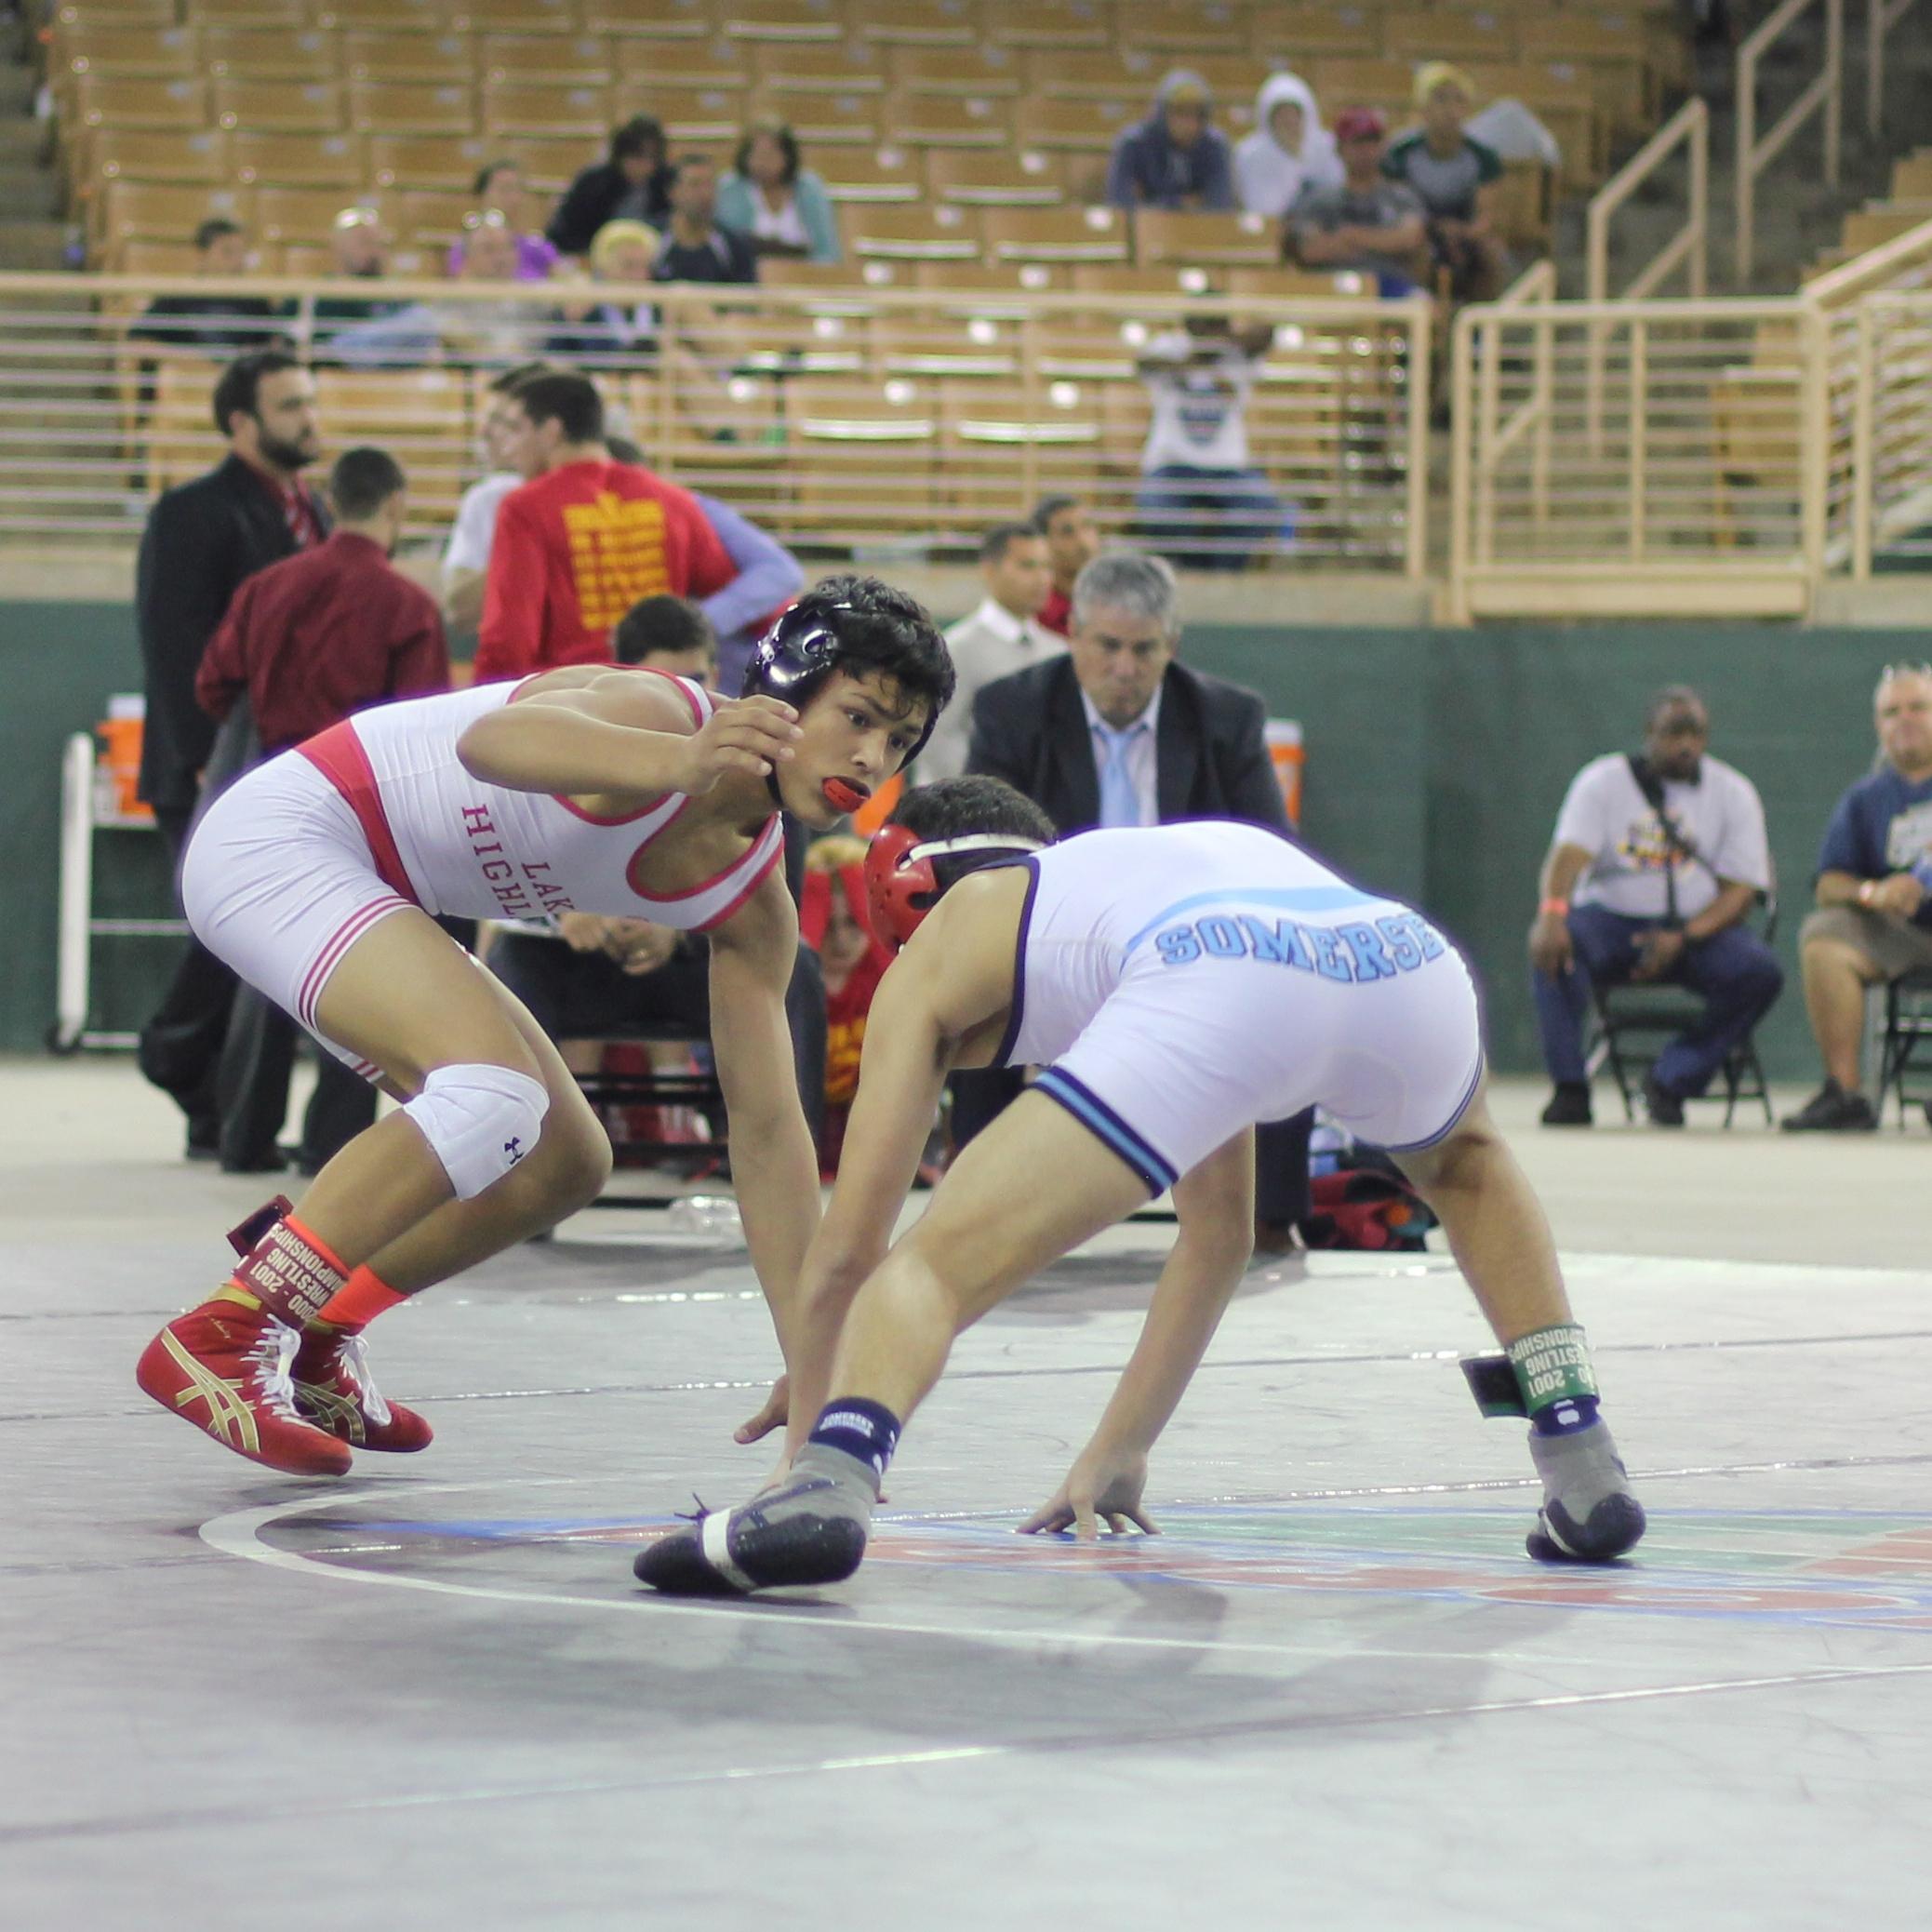 Silva beat Talshahar 15-4 to win the 2015 1A 113 lb.title